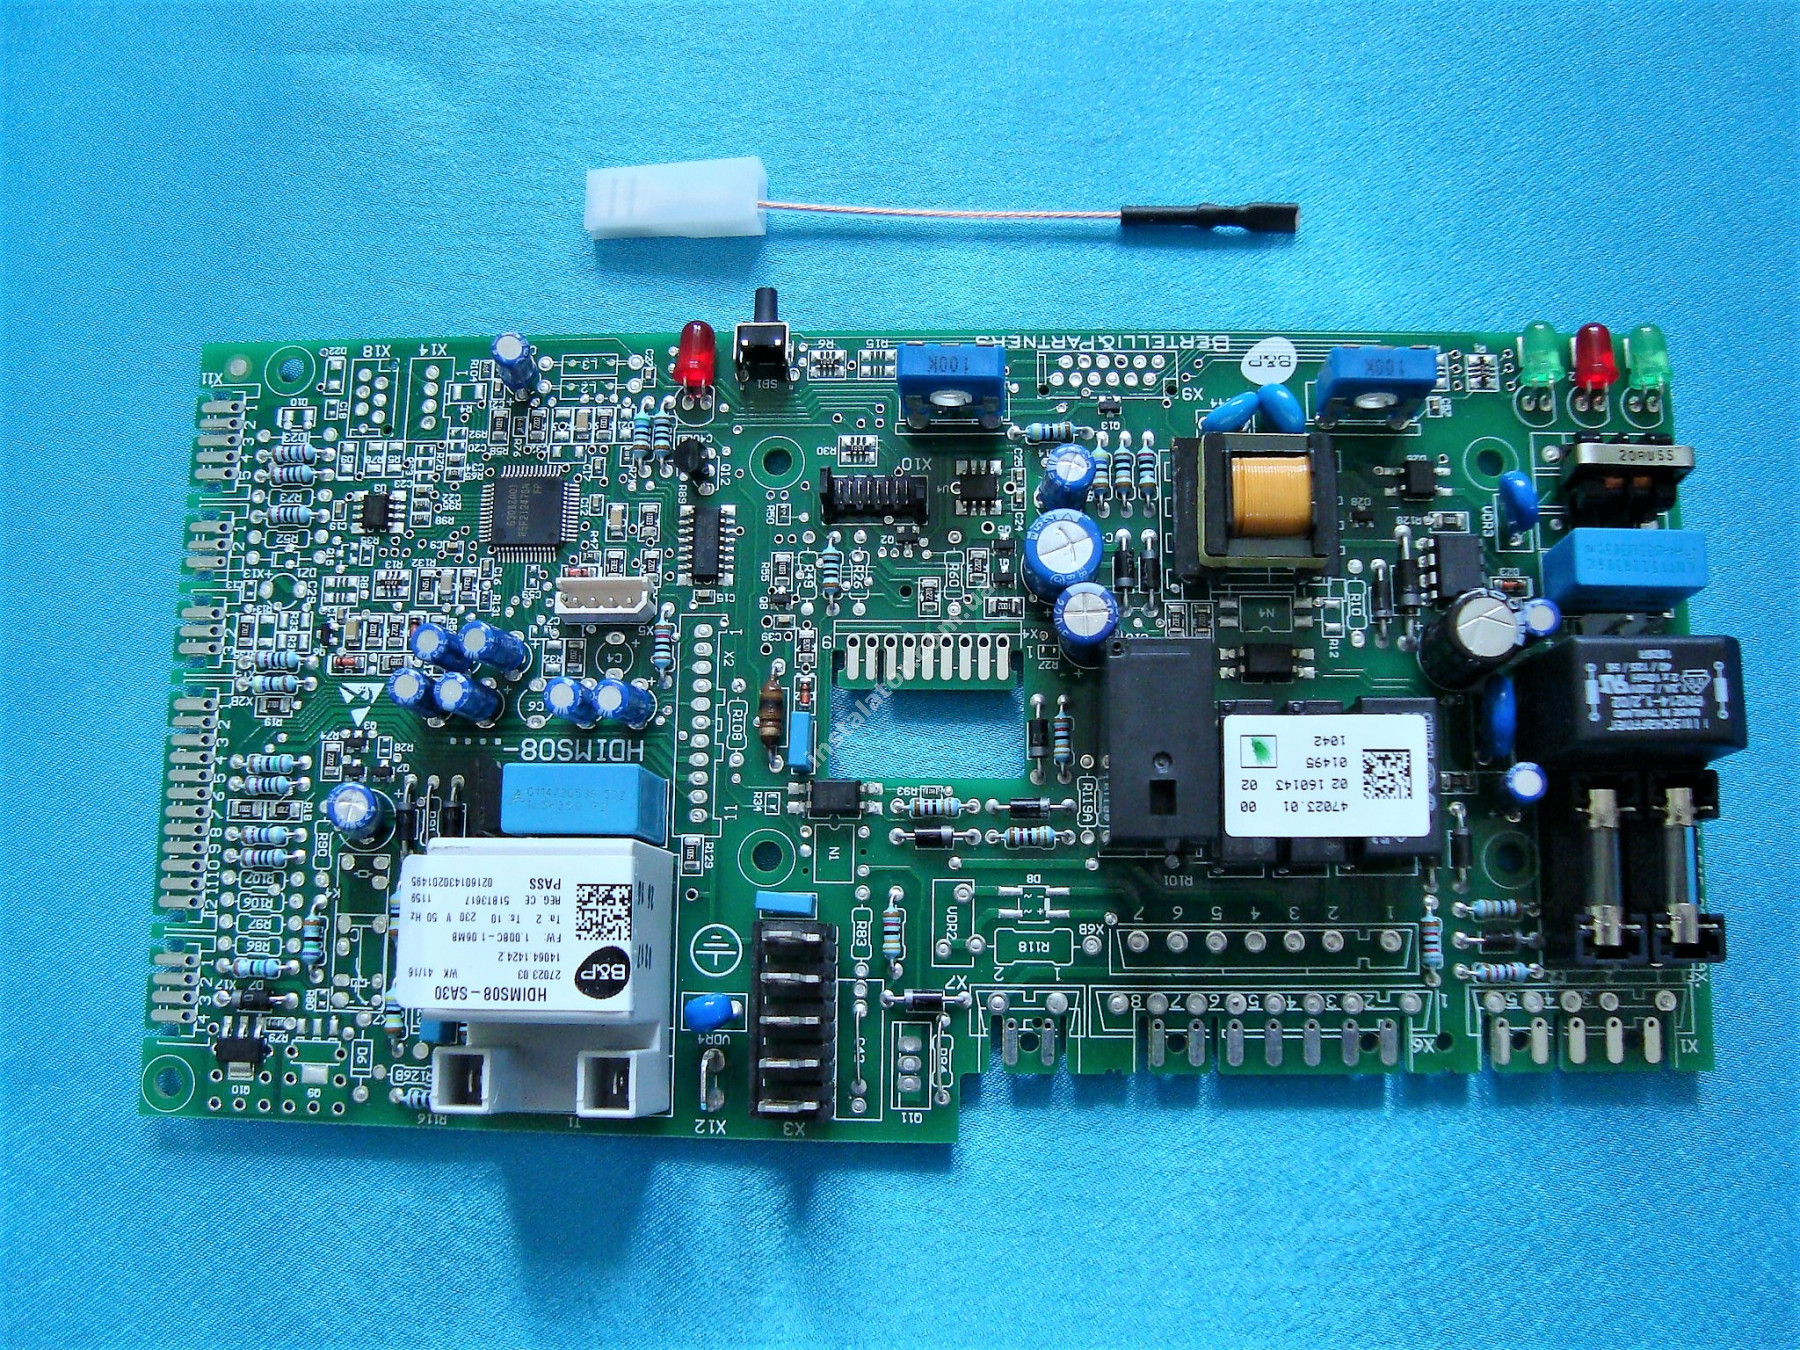 BI2075105 Плата керування Biasi Delta M97R full-image-1